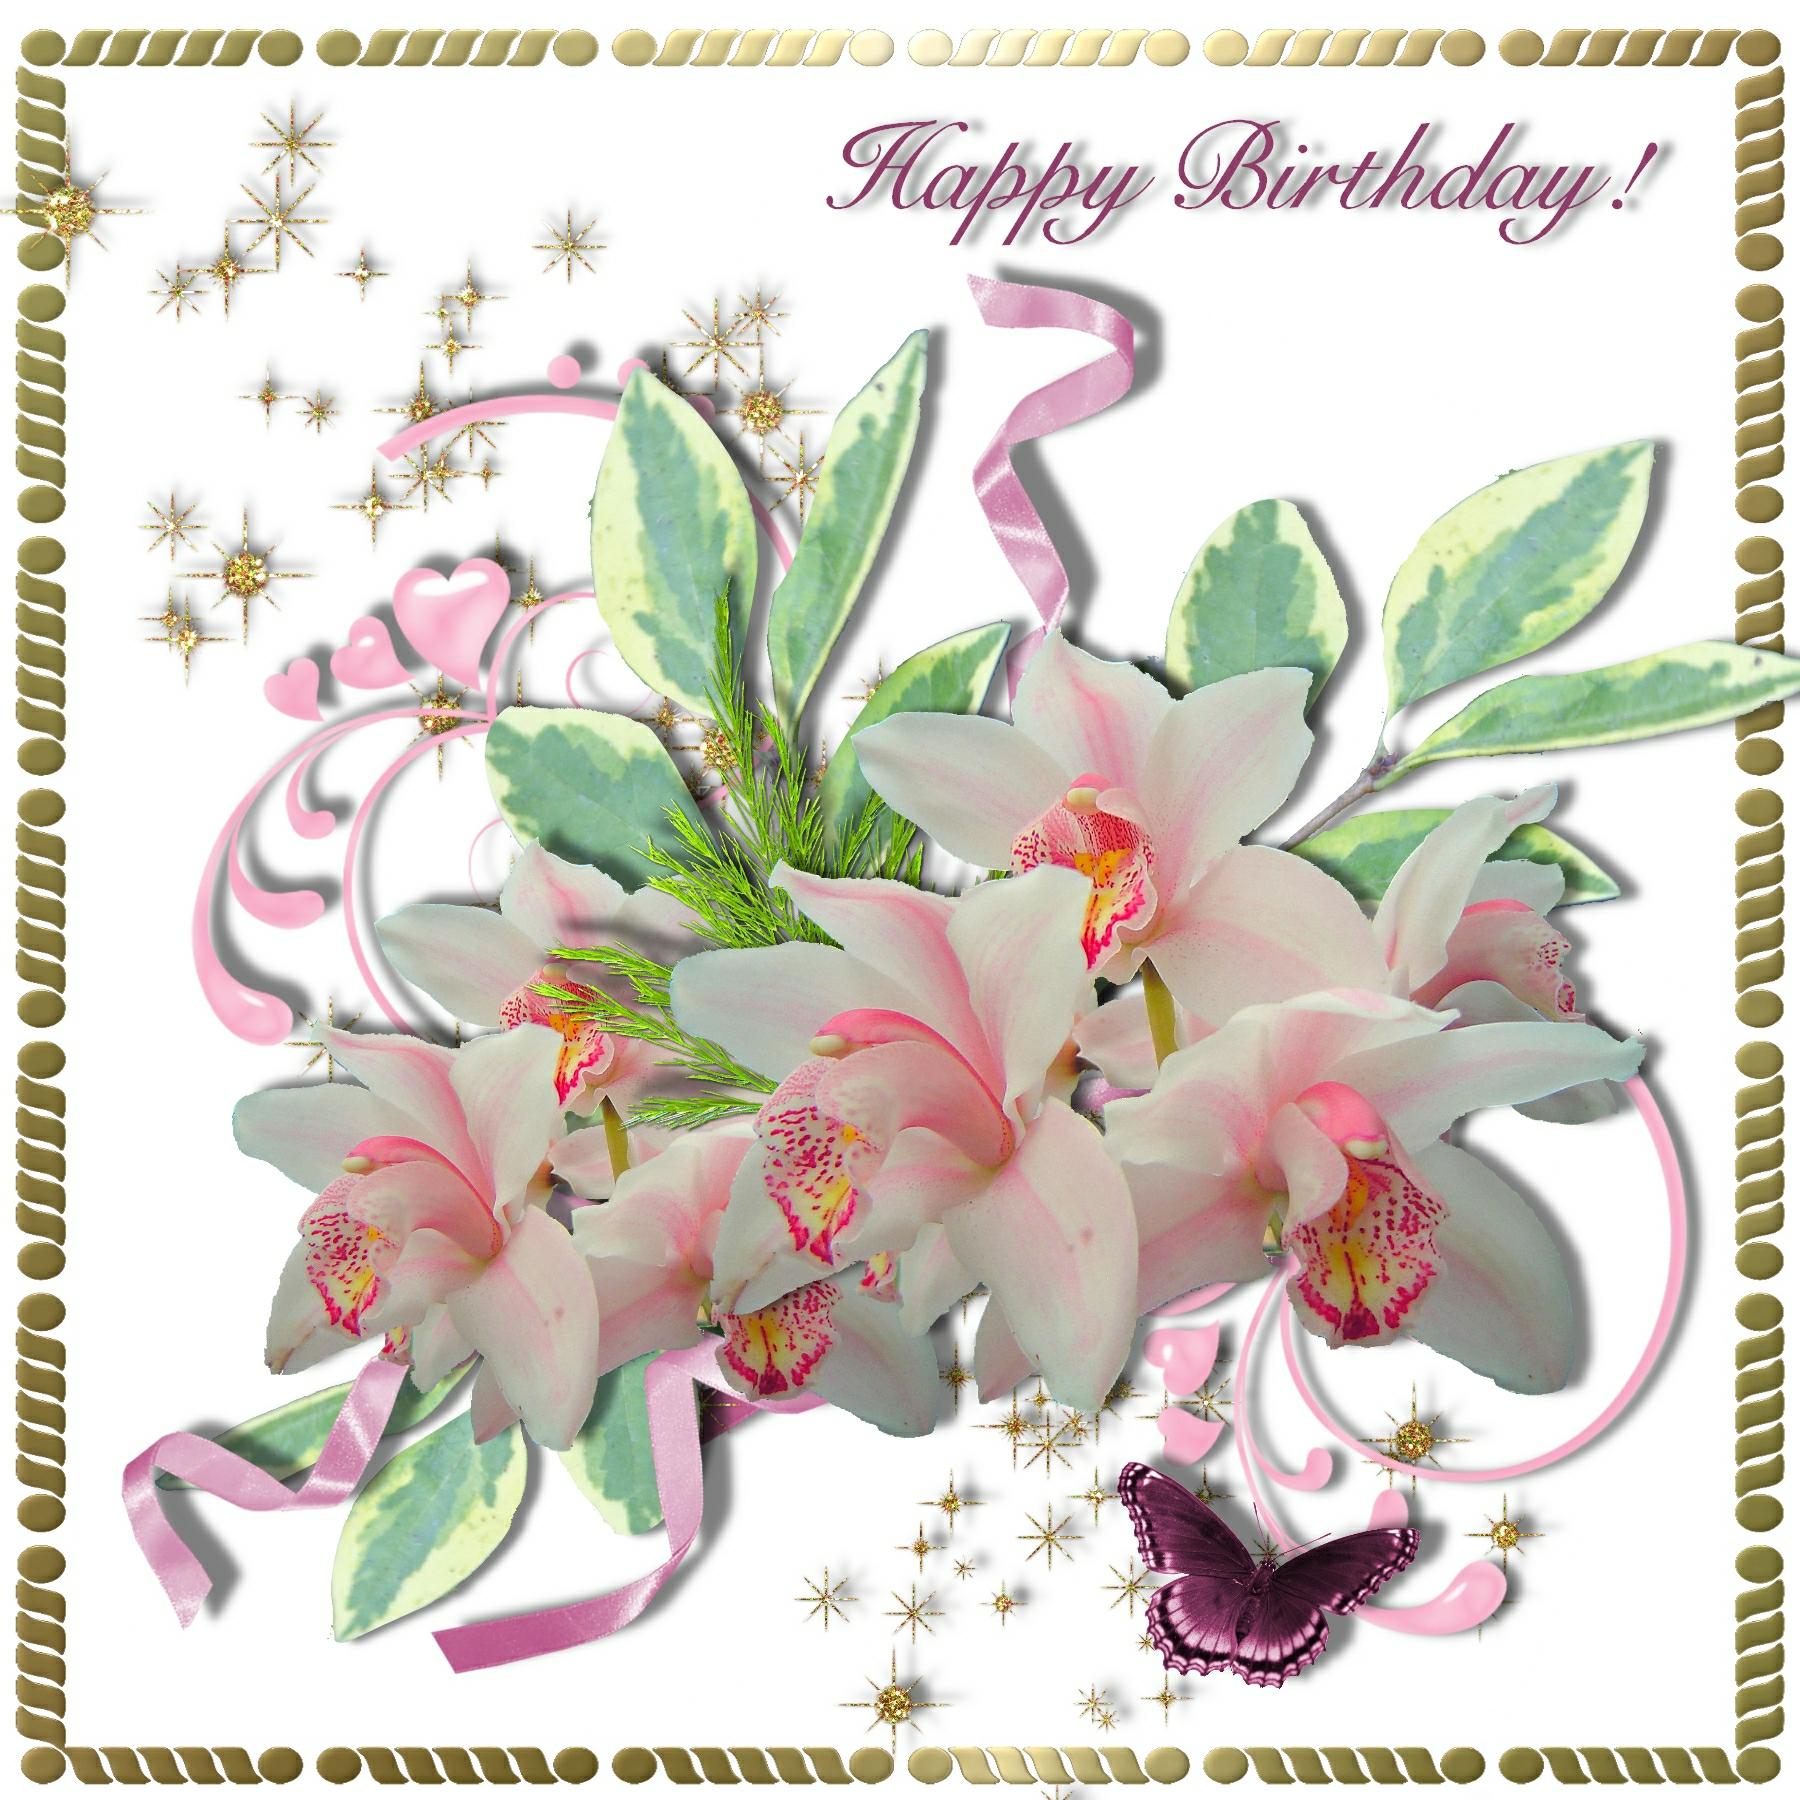 50th Birthday Card 2nd Place Sandies Blog